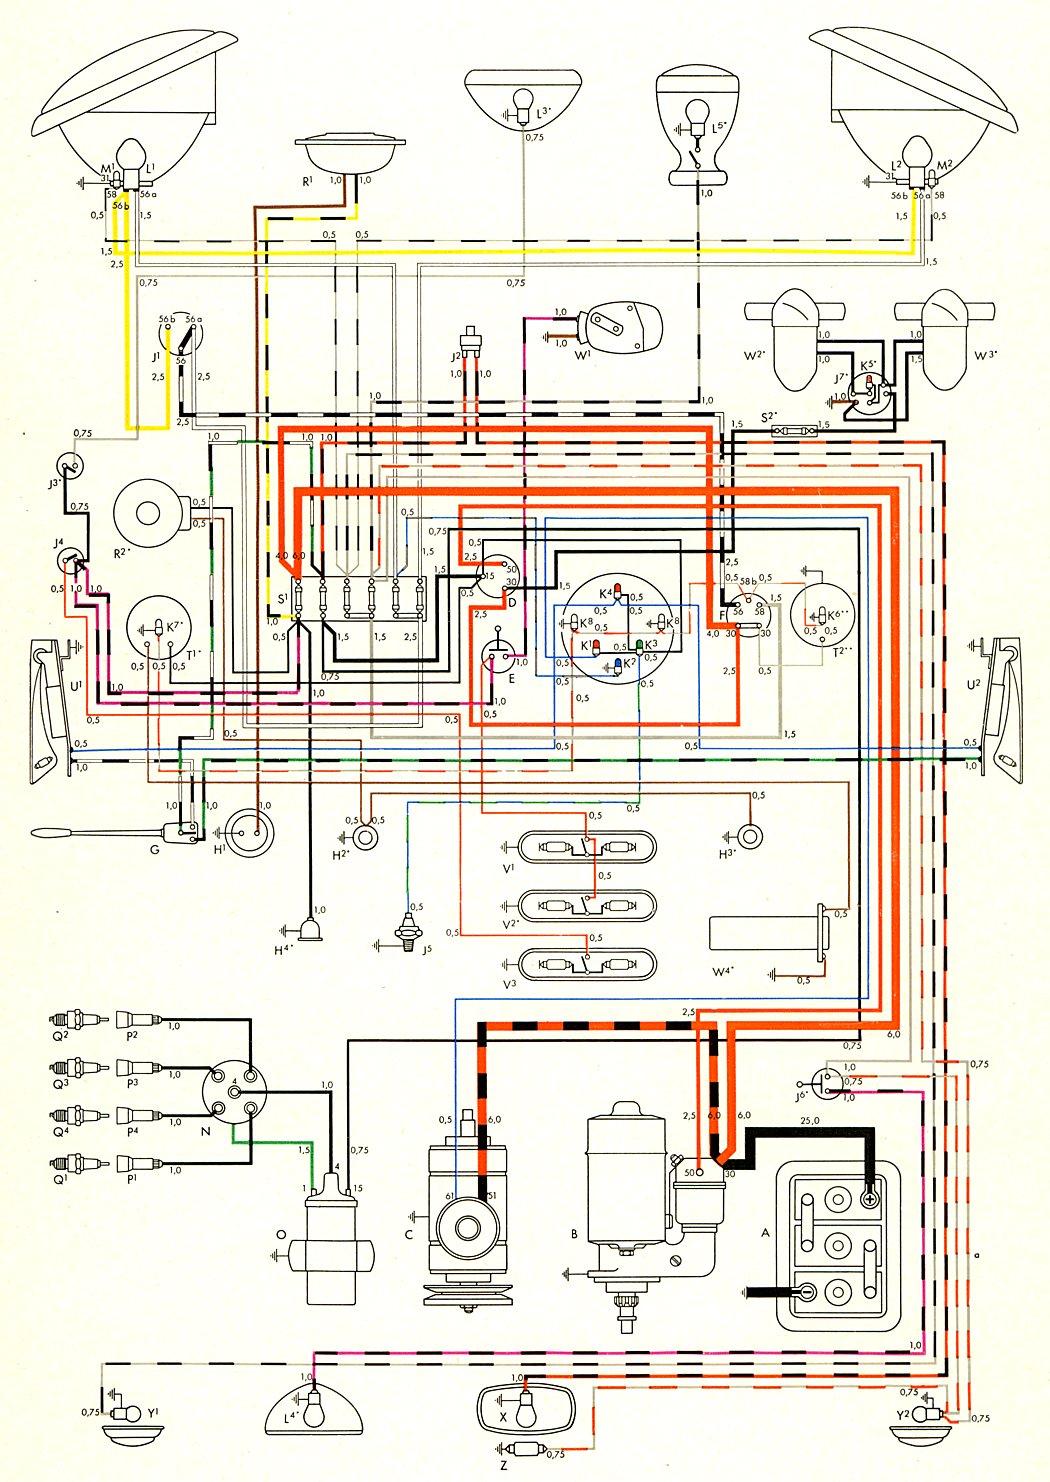 Vw T5 Headlight Wiring Diagram Library Wiper Motor On Bug Turn Signal T4 Loom Steering Diagrams